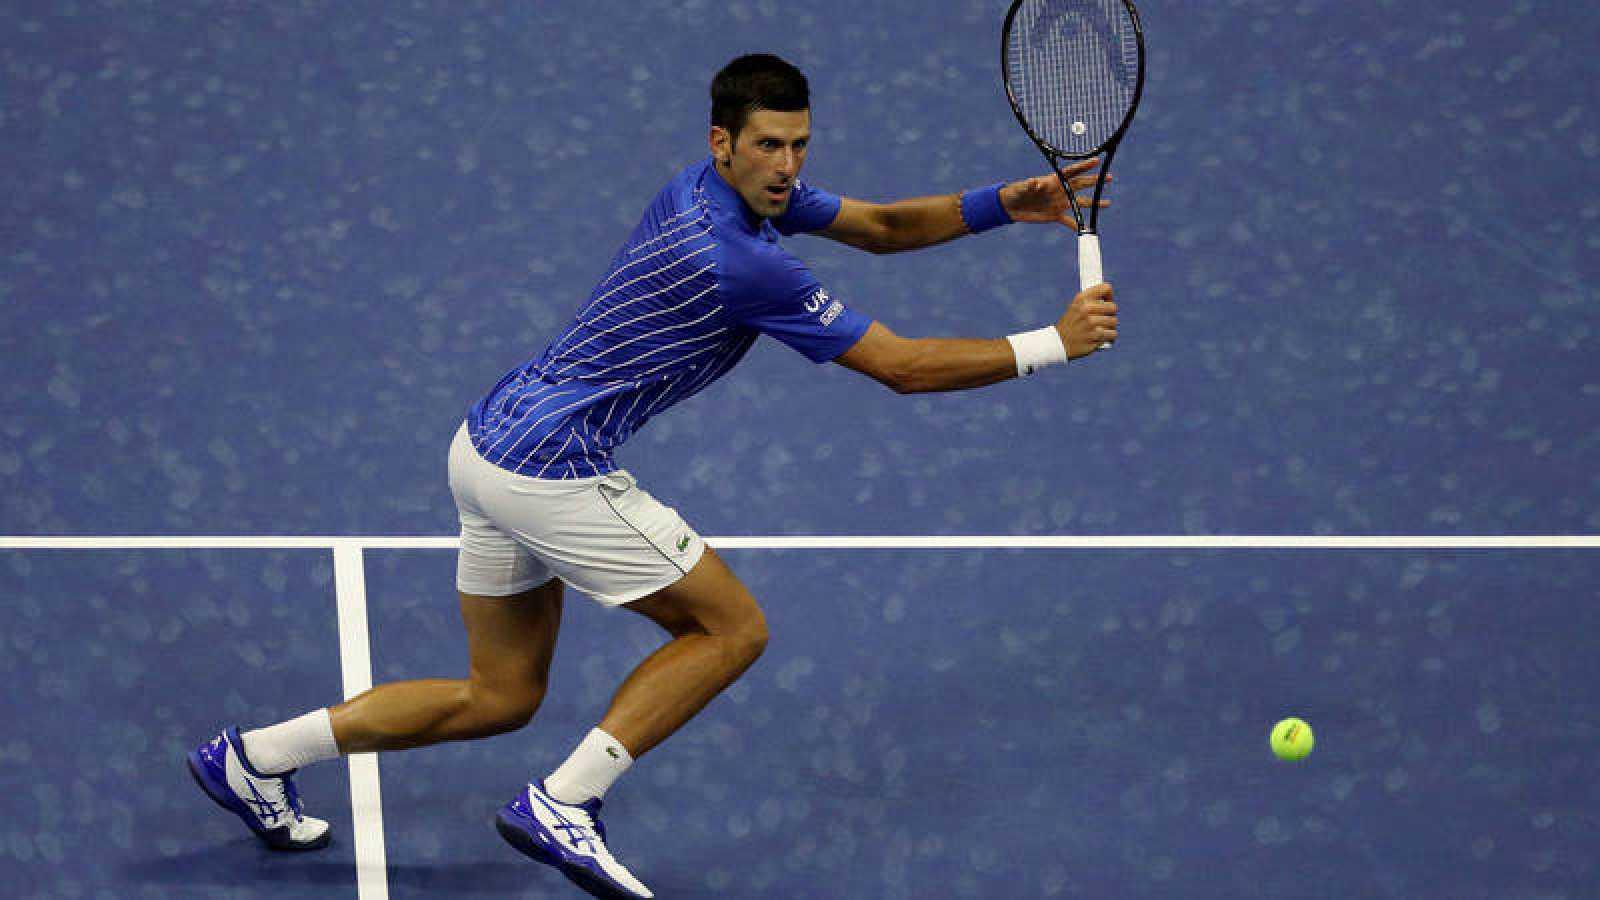 Djokovic devuelve una bola